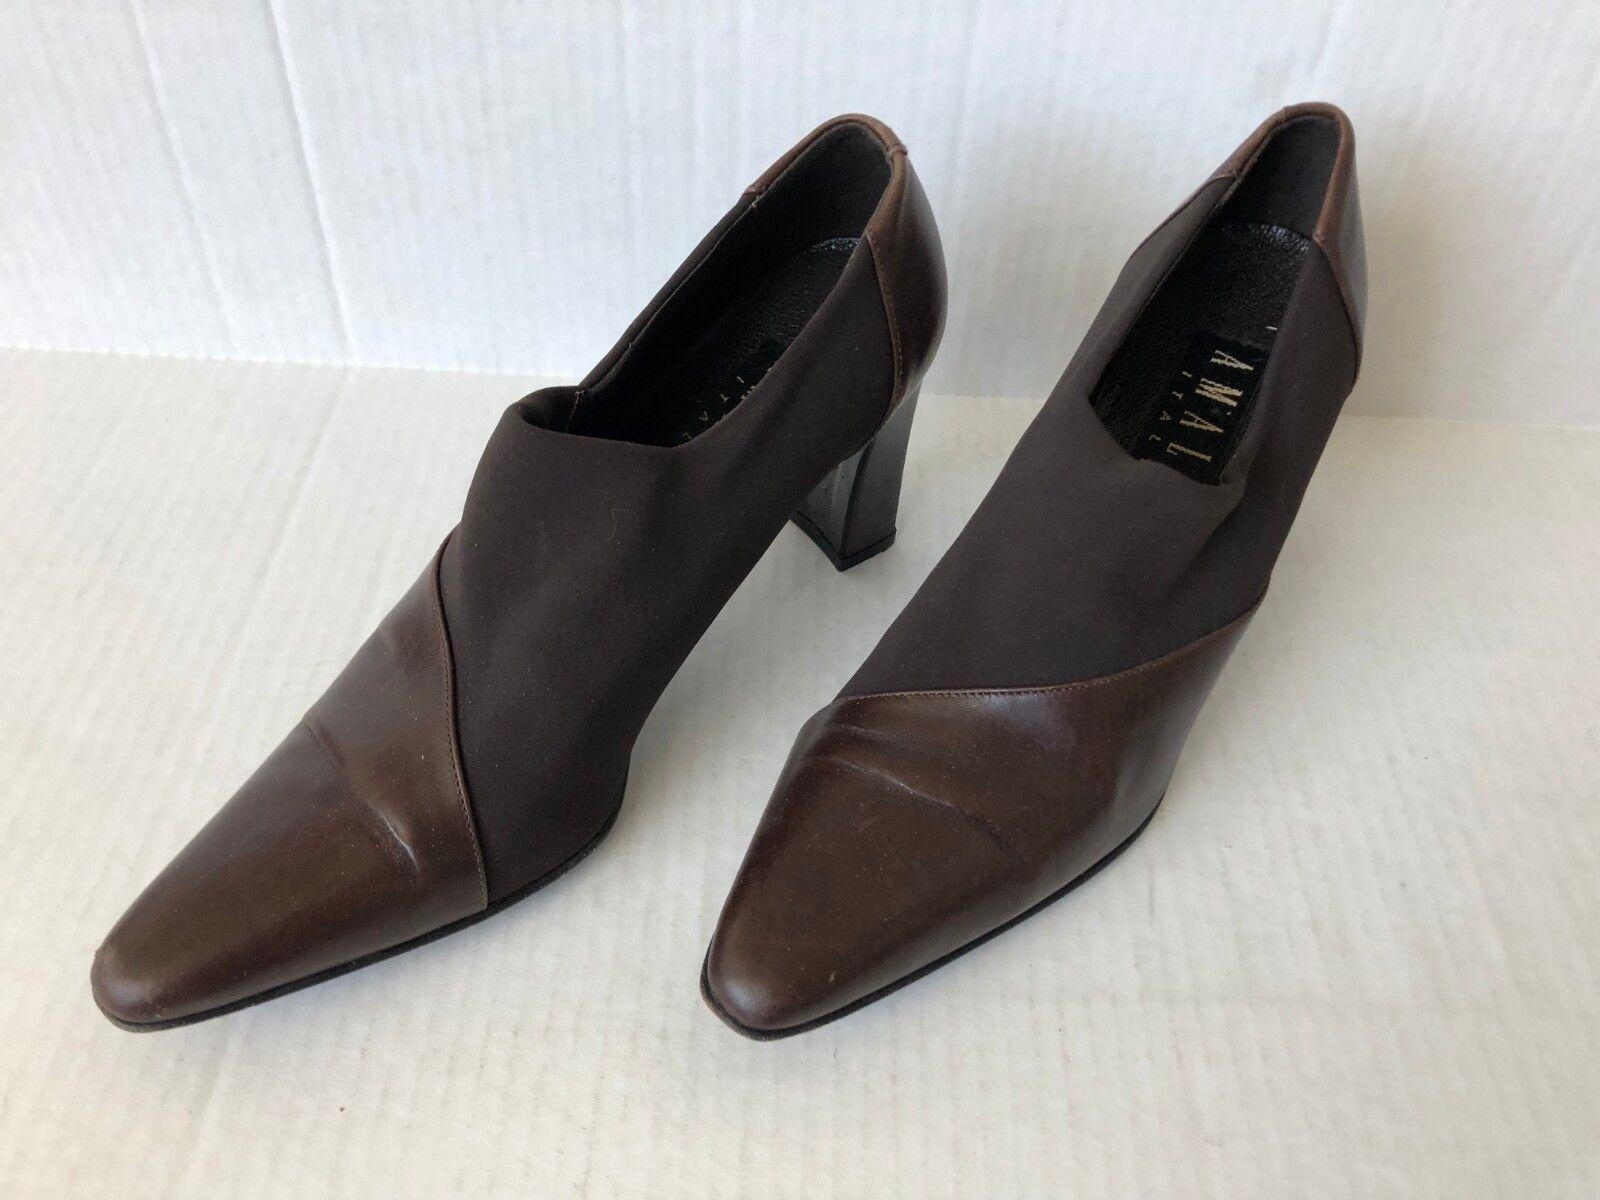 AMALFI Booties Brown Italian Leather Ankle High Heeled 7 Closed Toe